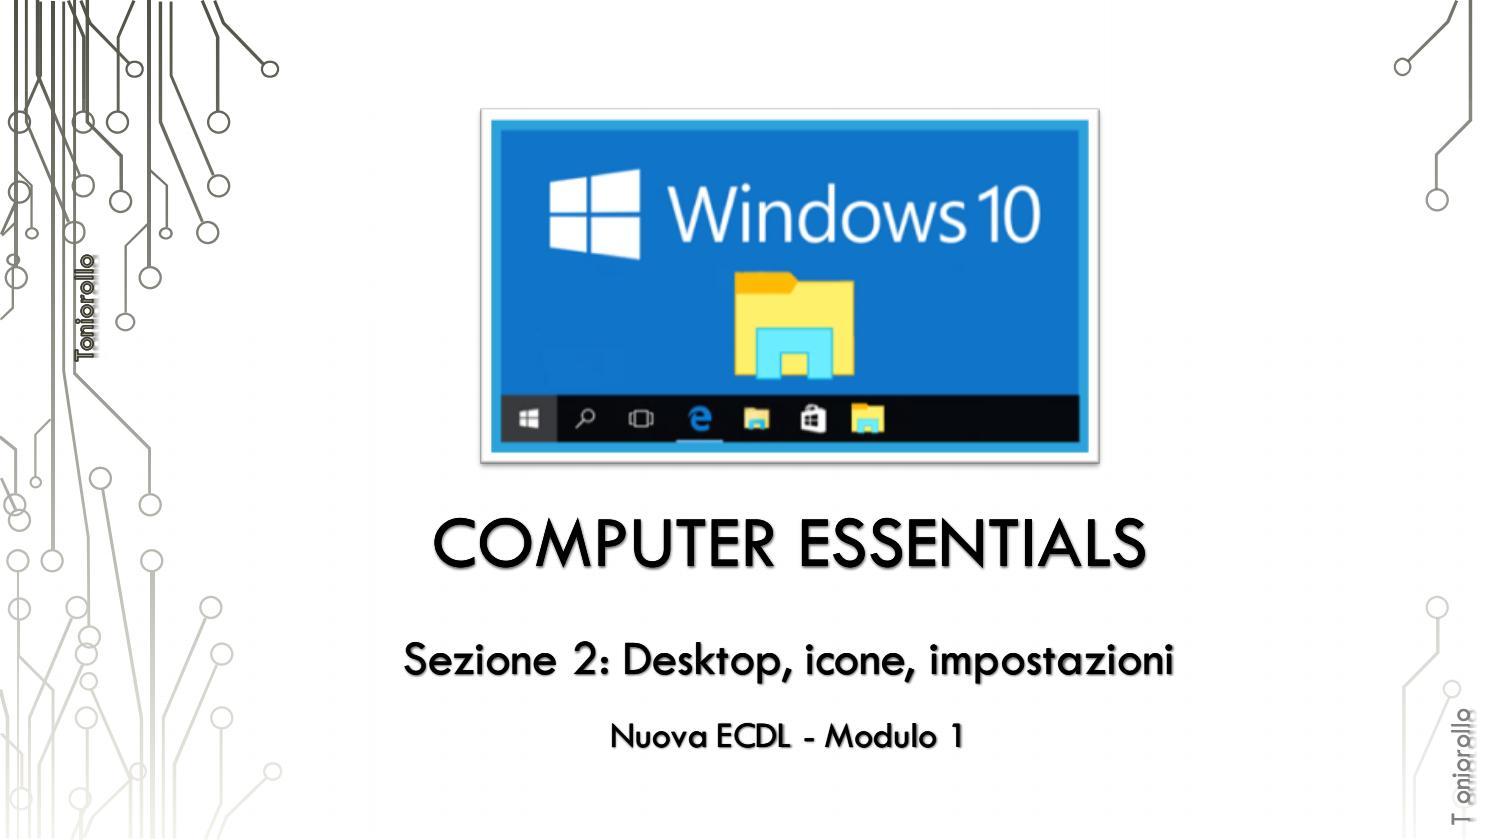 Computer Essentials Parte 2 By Tonio Rollo Issuu